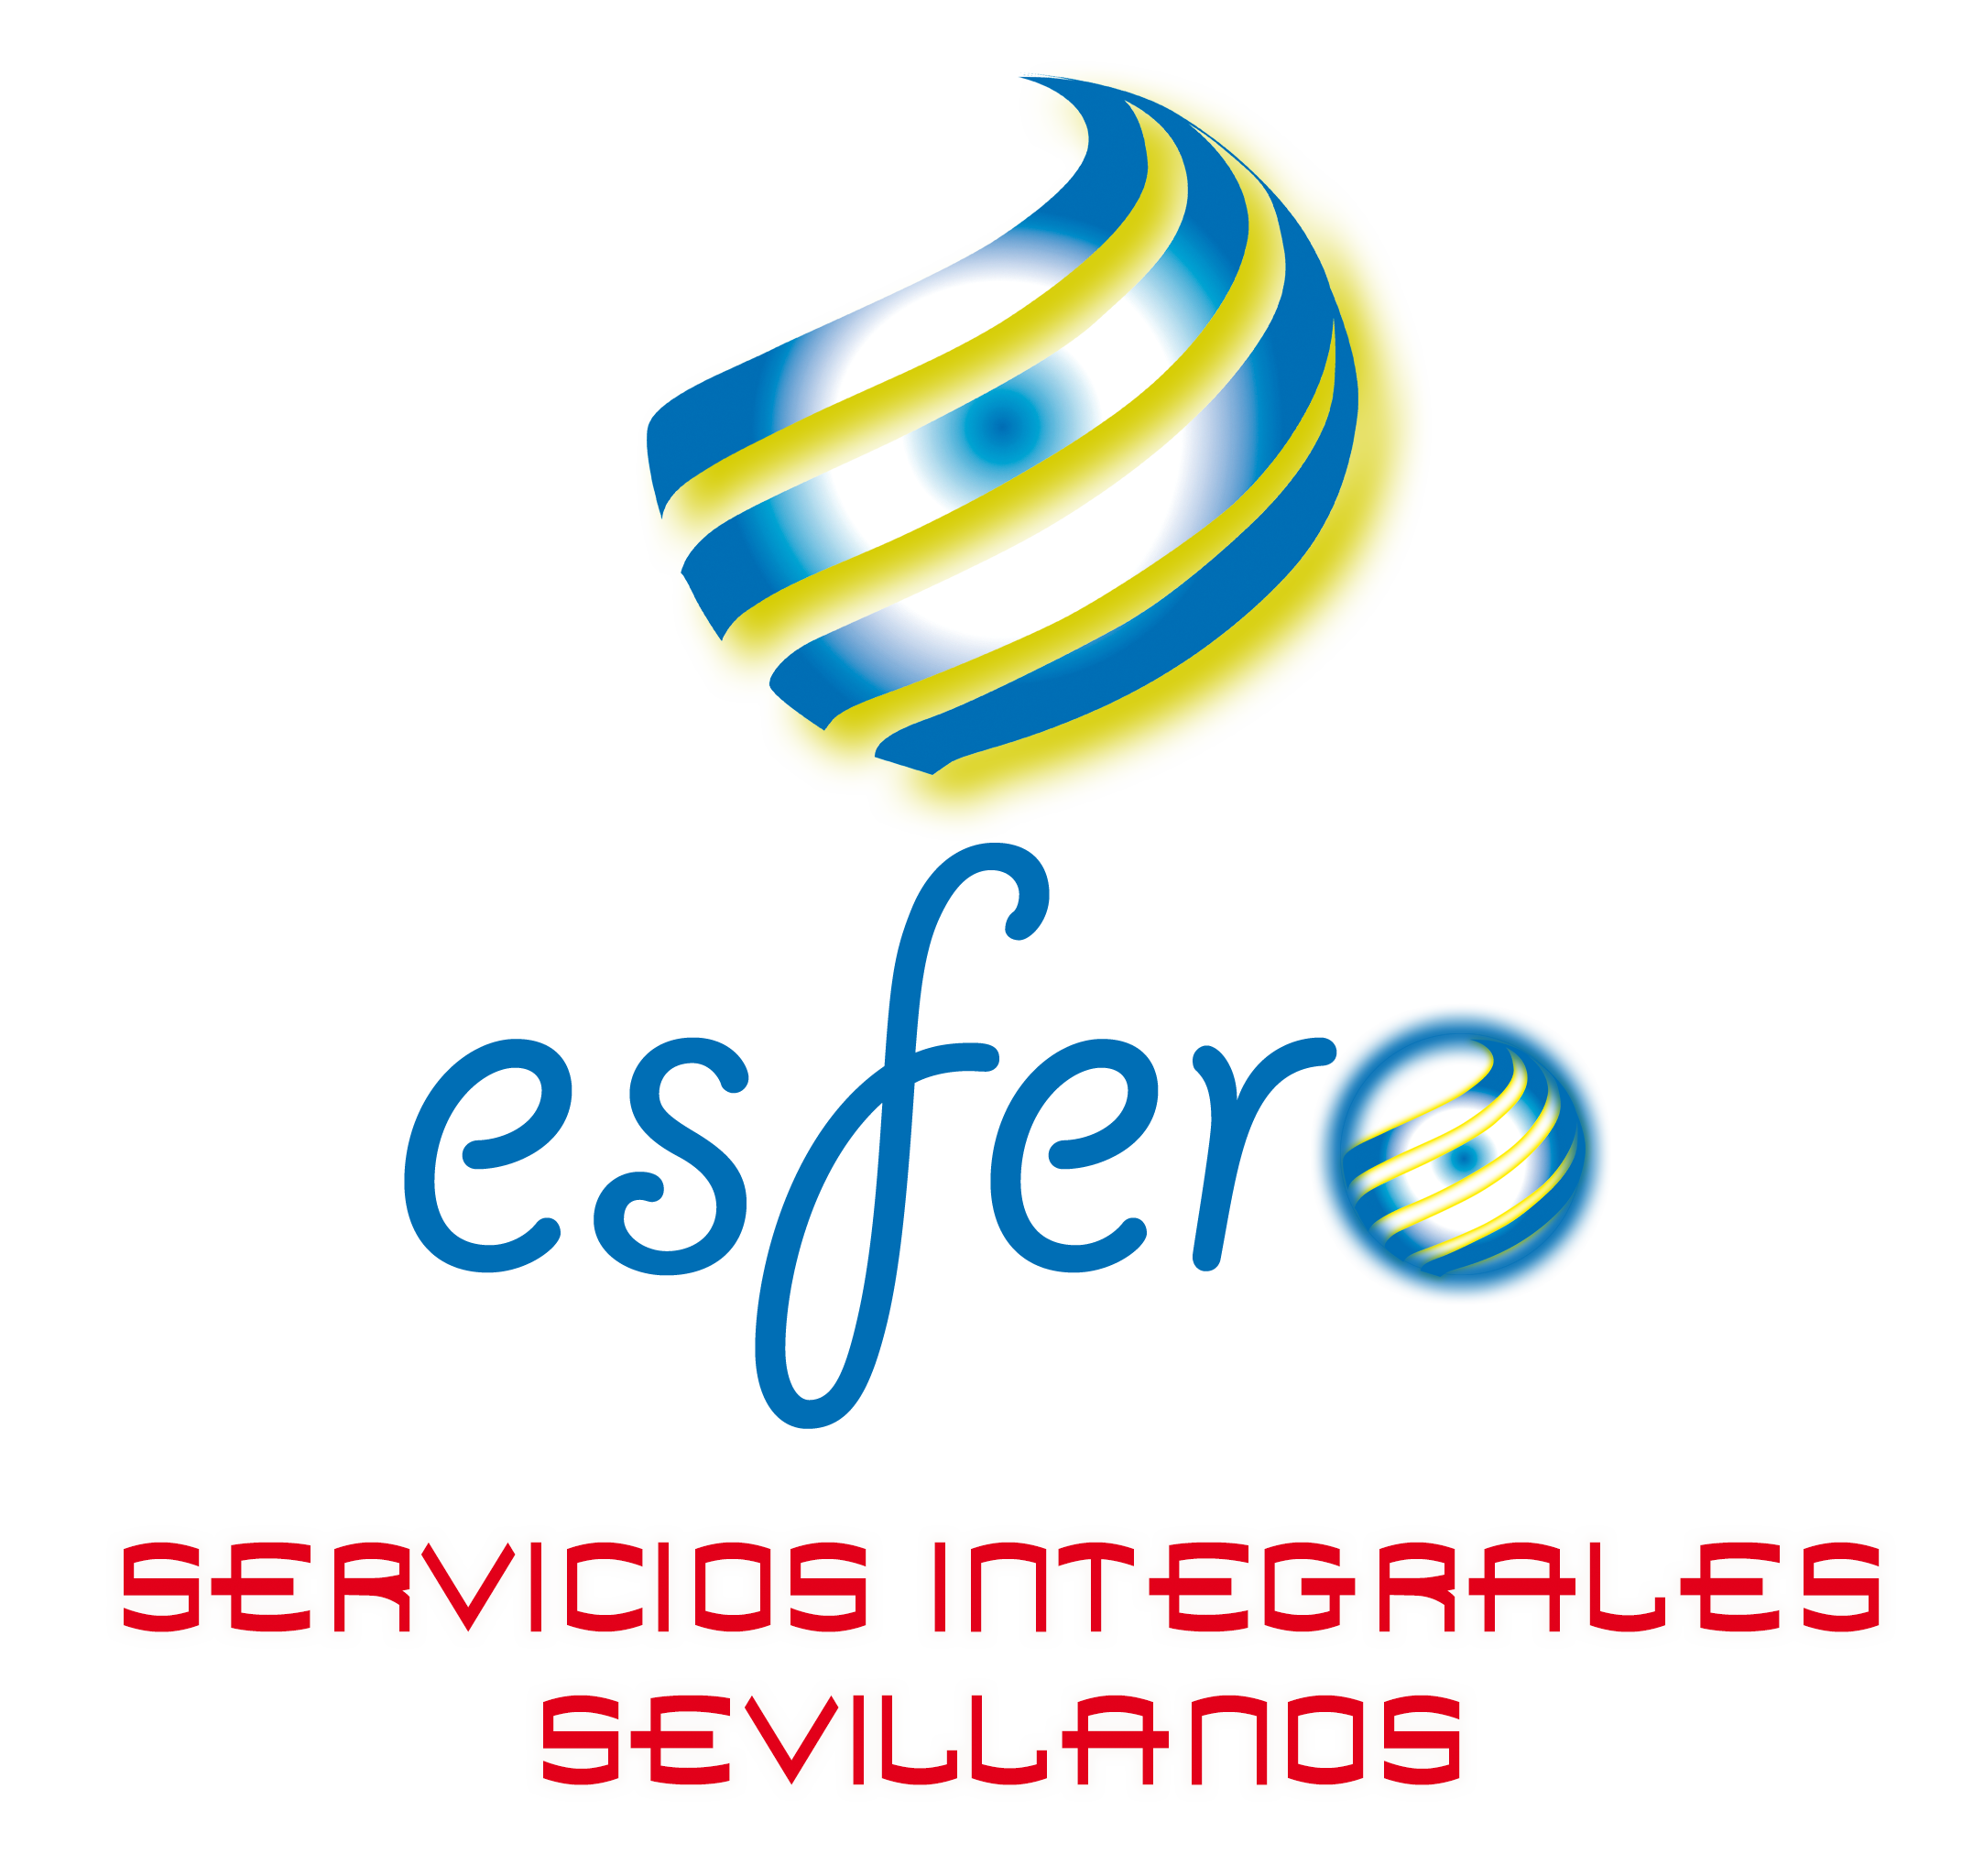 Esfero Servicios Sevillano S.L.U.